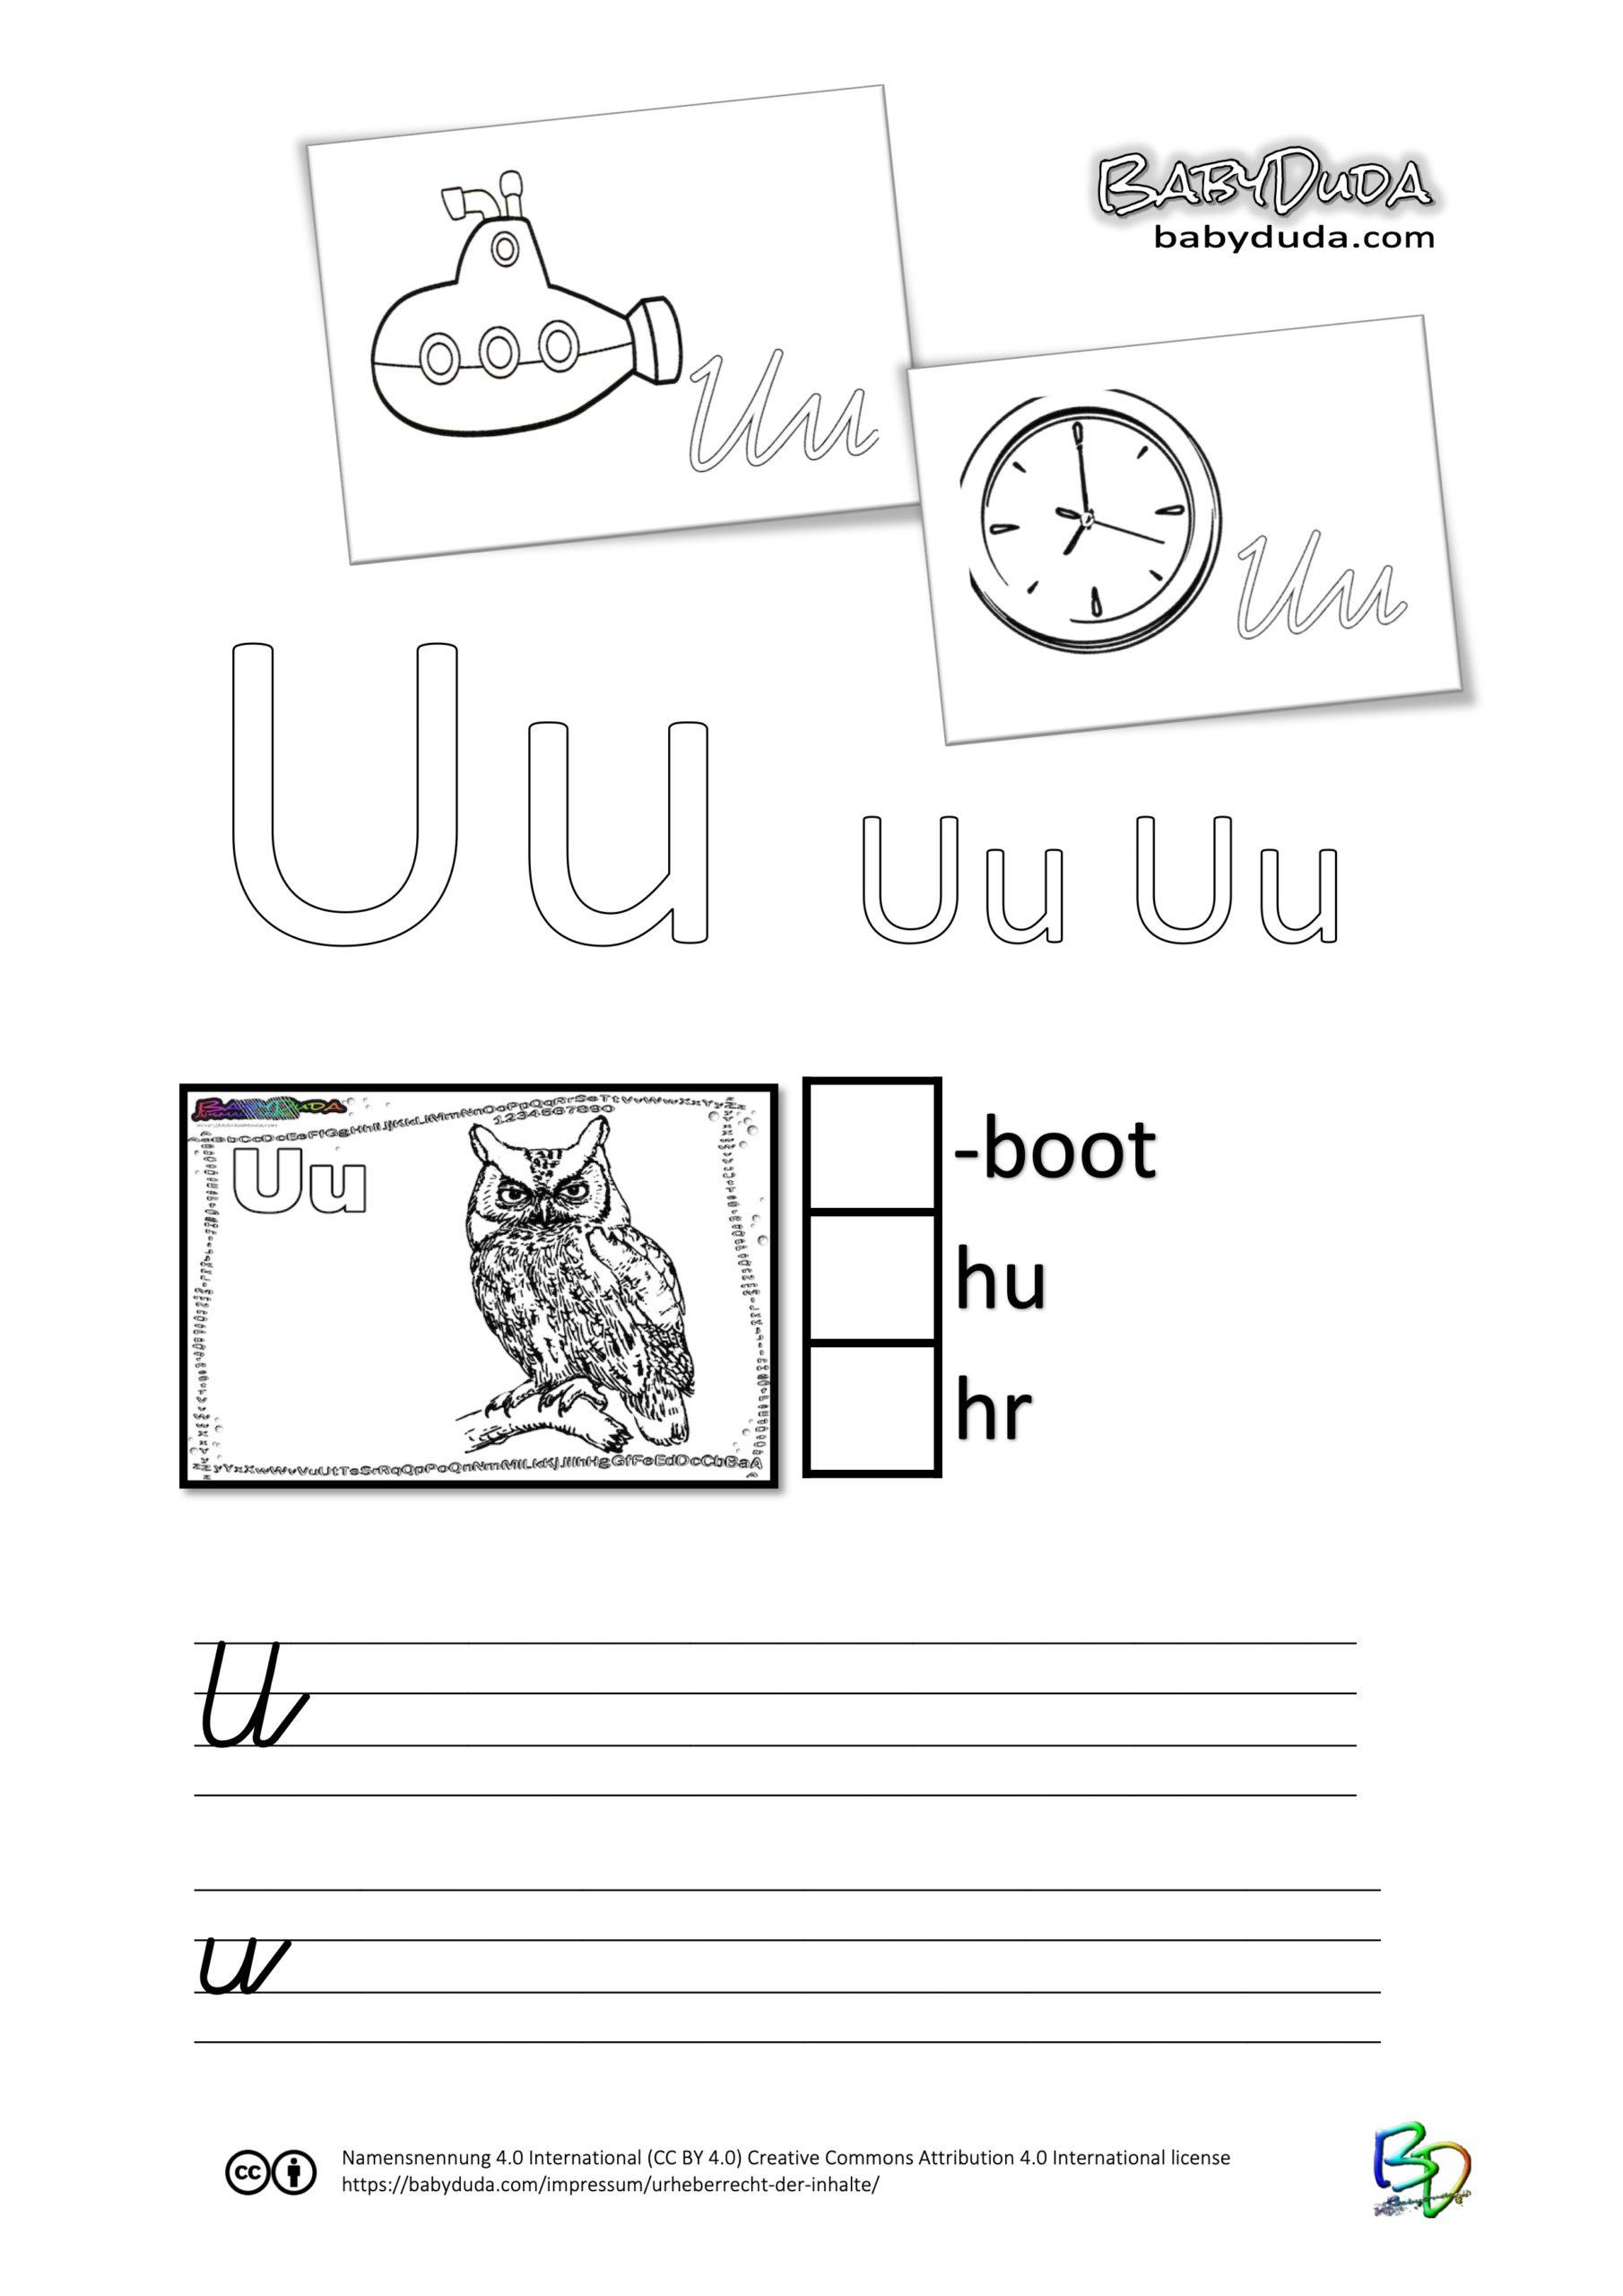 ABC-Ausmalbuch-Arbeitsblatt-U